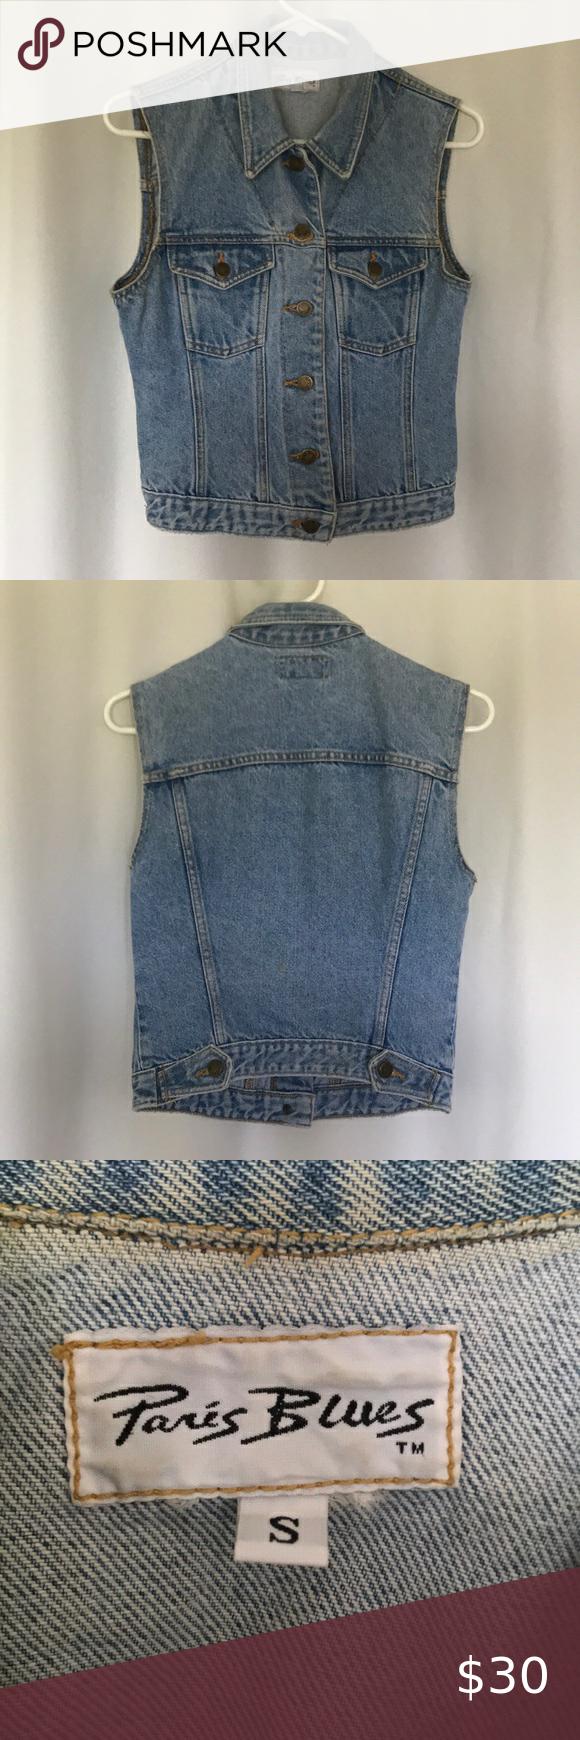 Paris Blues Denim Sleeveless Vest Very 90s Vintage Jean Button Up Sleeveless Vest Size Small In Great Used Conditi Sleeveless Vest Blue Denim Blue Outerwear [ 1740 x 580 Pixel ]